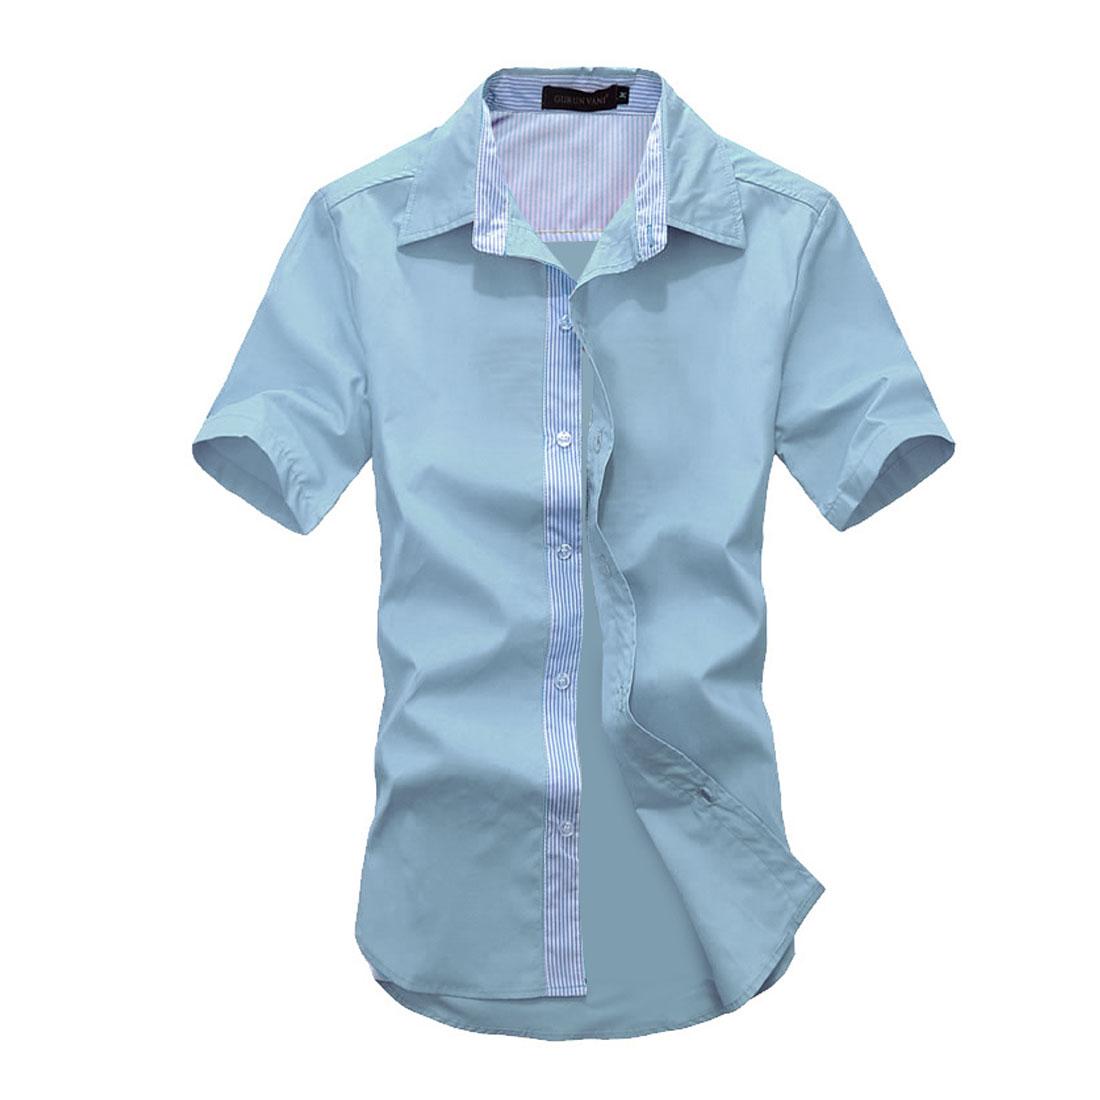 Men Stripes Buttons Front Short-sleeved Tops Shirts Light Blue M